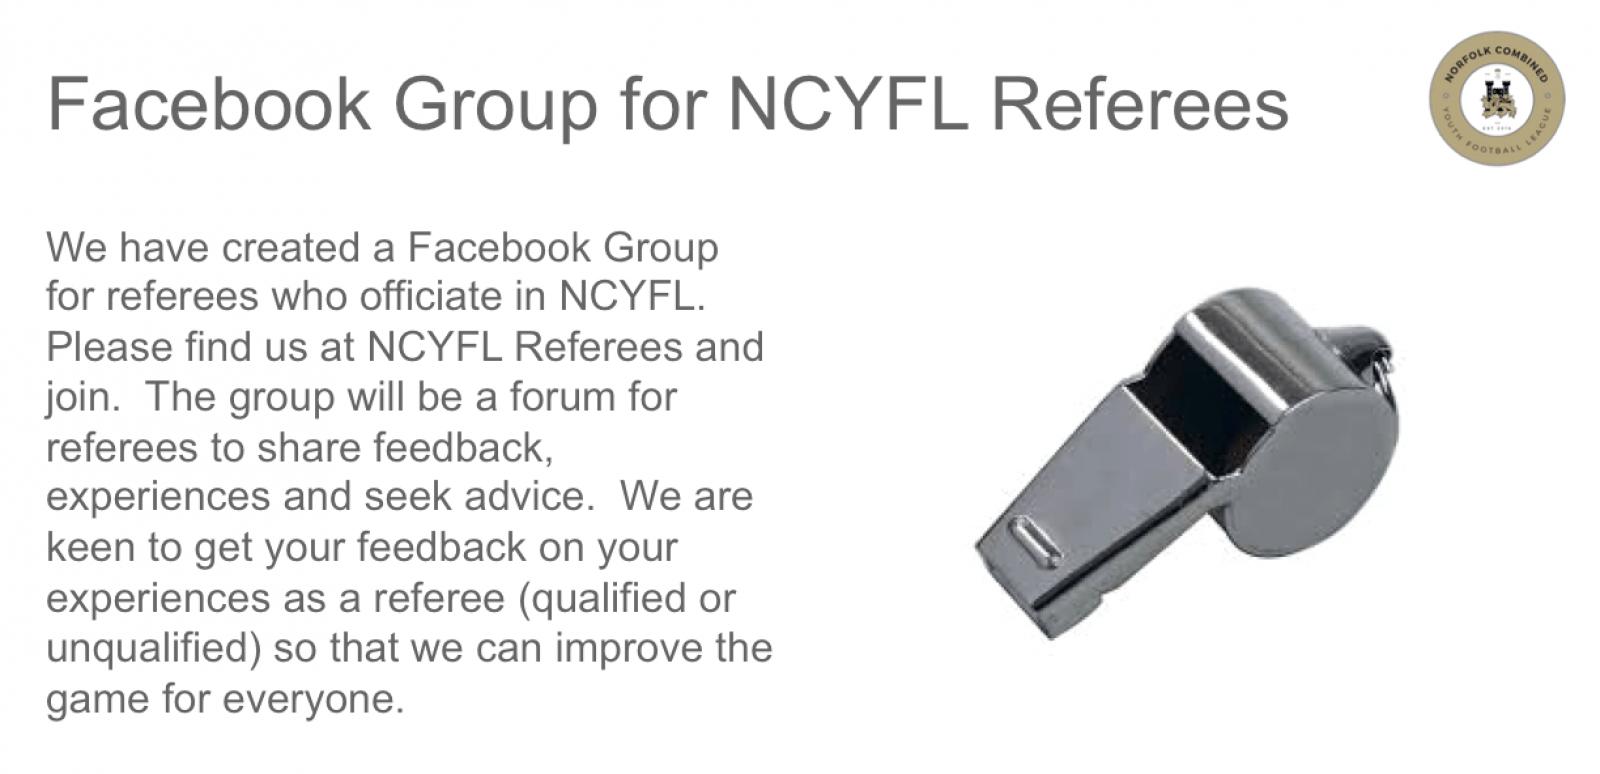 Facebook Referees